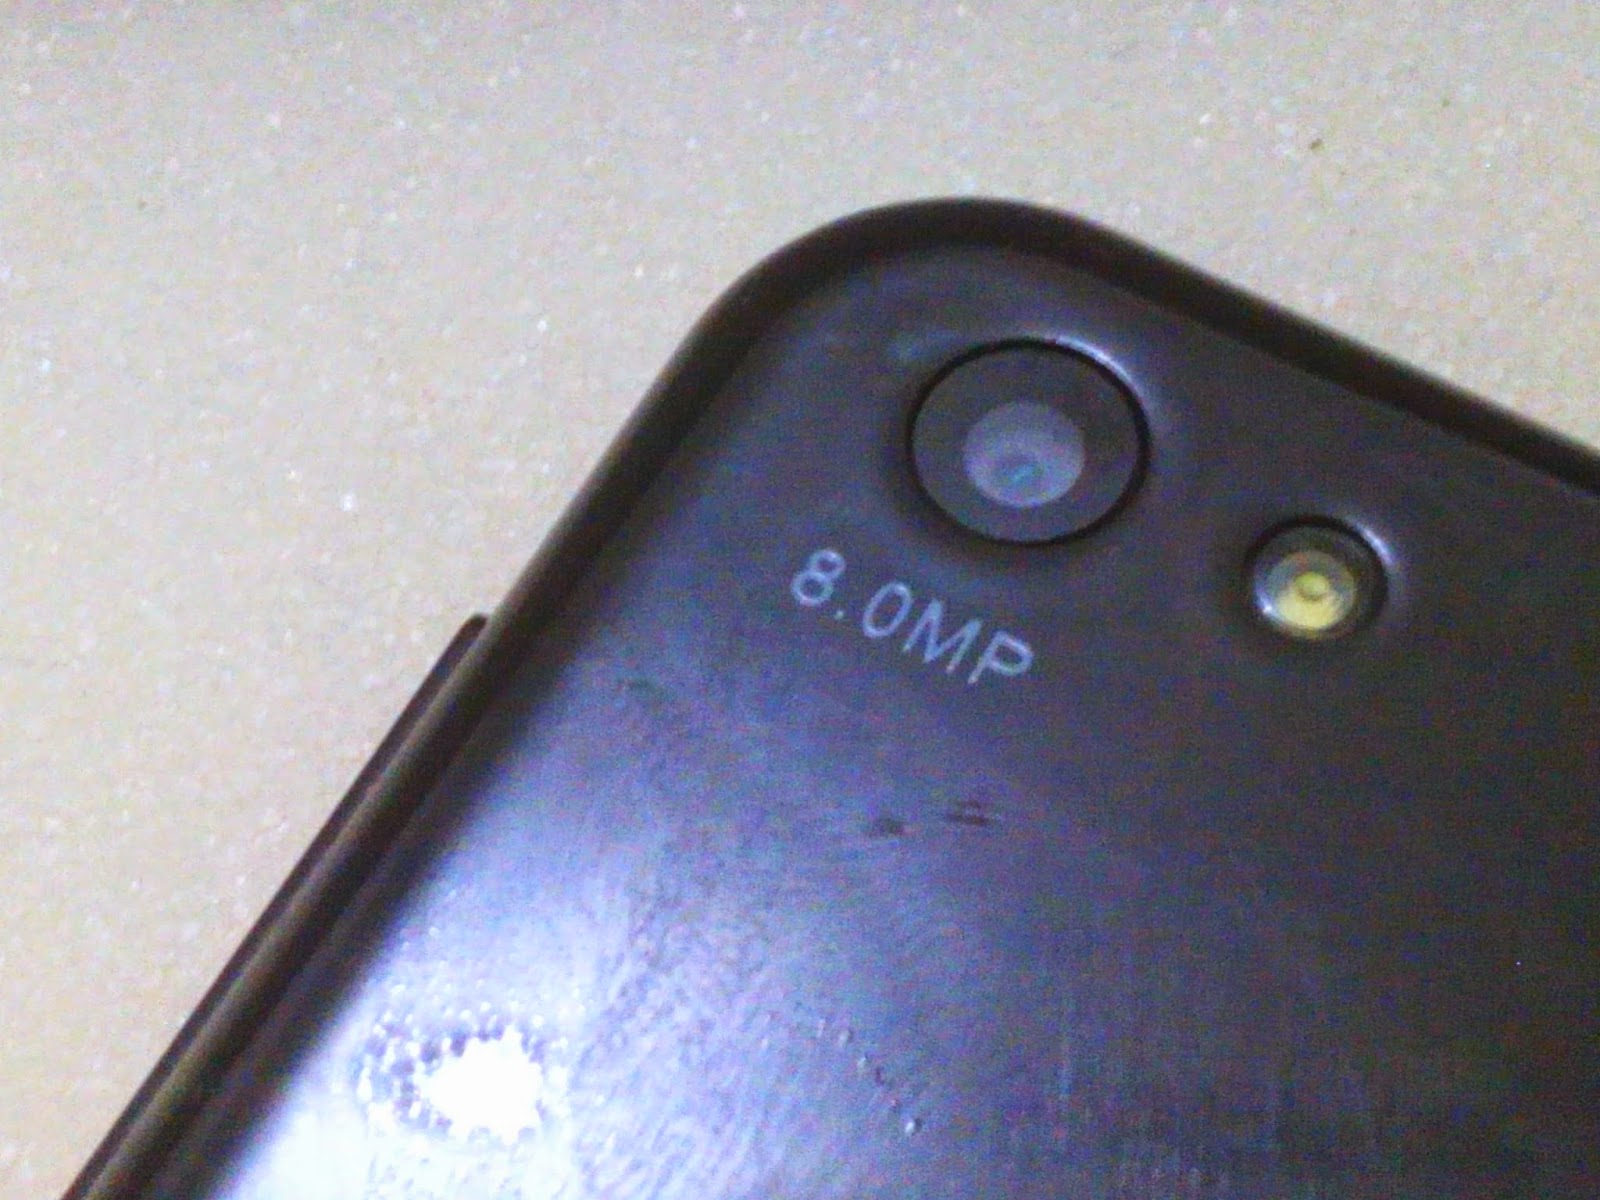 Posisi Belakang Terdapat Evercoss Logo Camera 8mp LED Flash Nampak Bodi Atas Port Jack 35mm Dan USB Di Sisi Samping Kanan Volume